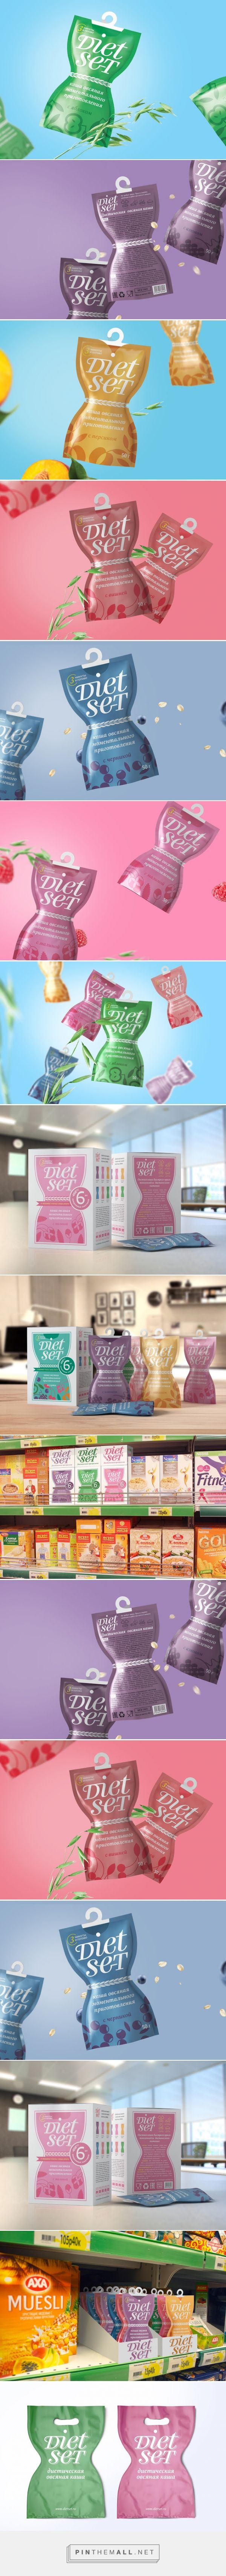 Diet Set - Instant #Cereals #concept #packaging by Arthur Lebsack - http://www.packagingoftheworld.com/2015/02/diet-set-instant-cereals.html